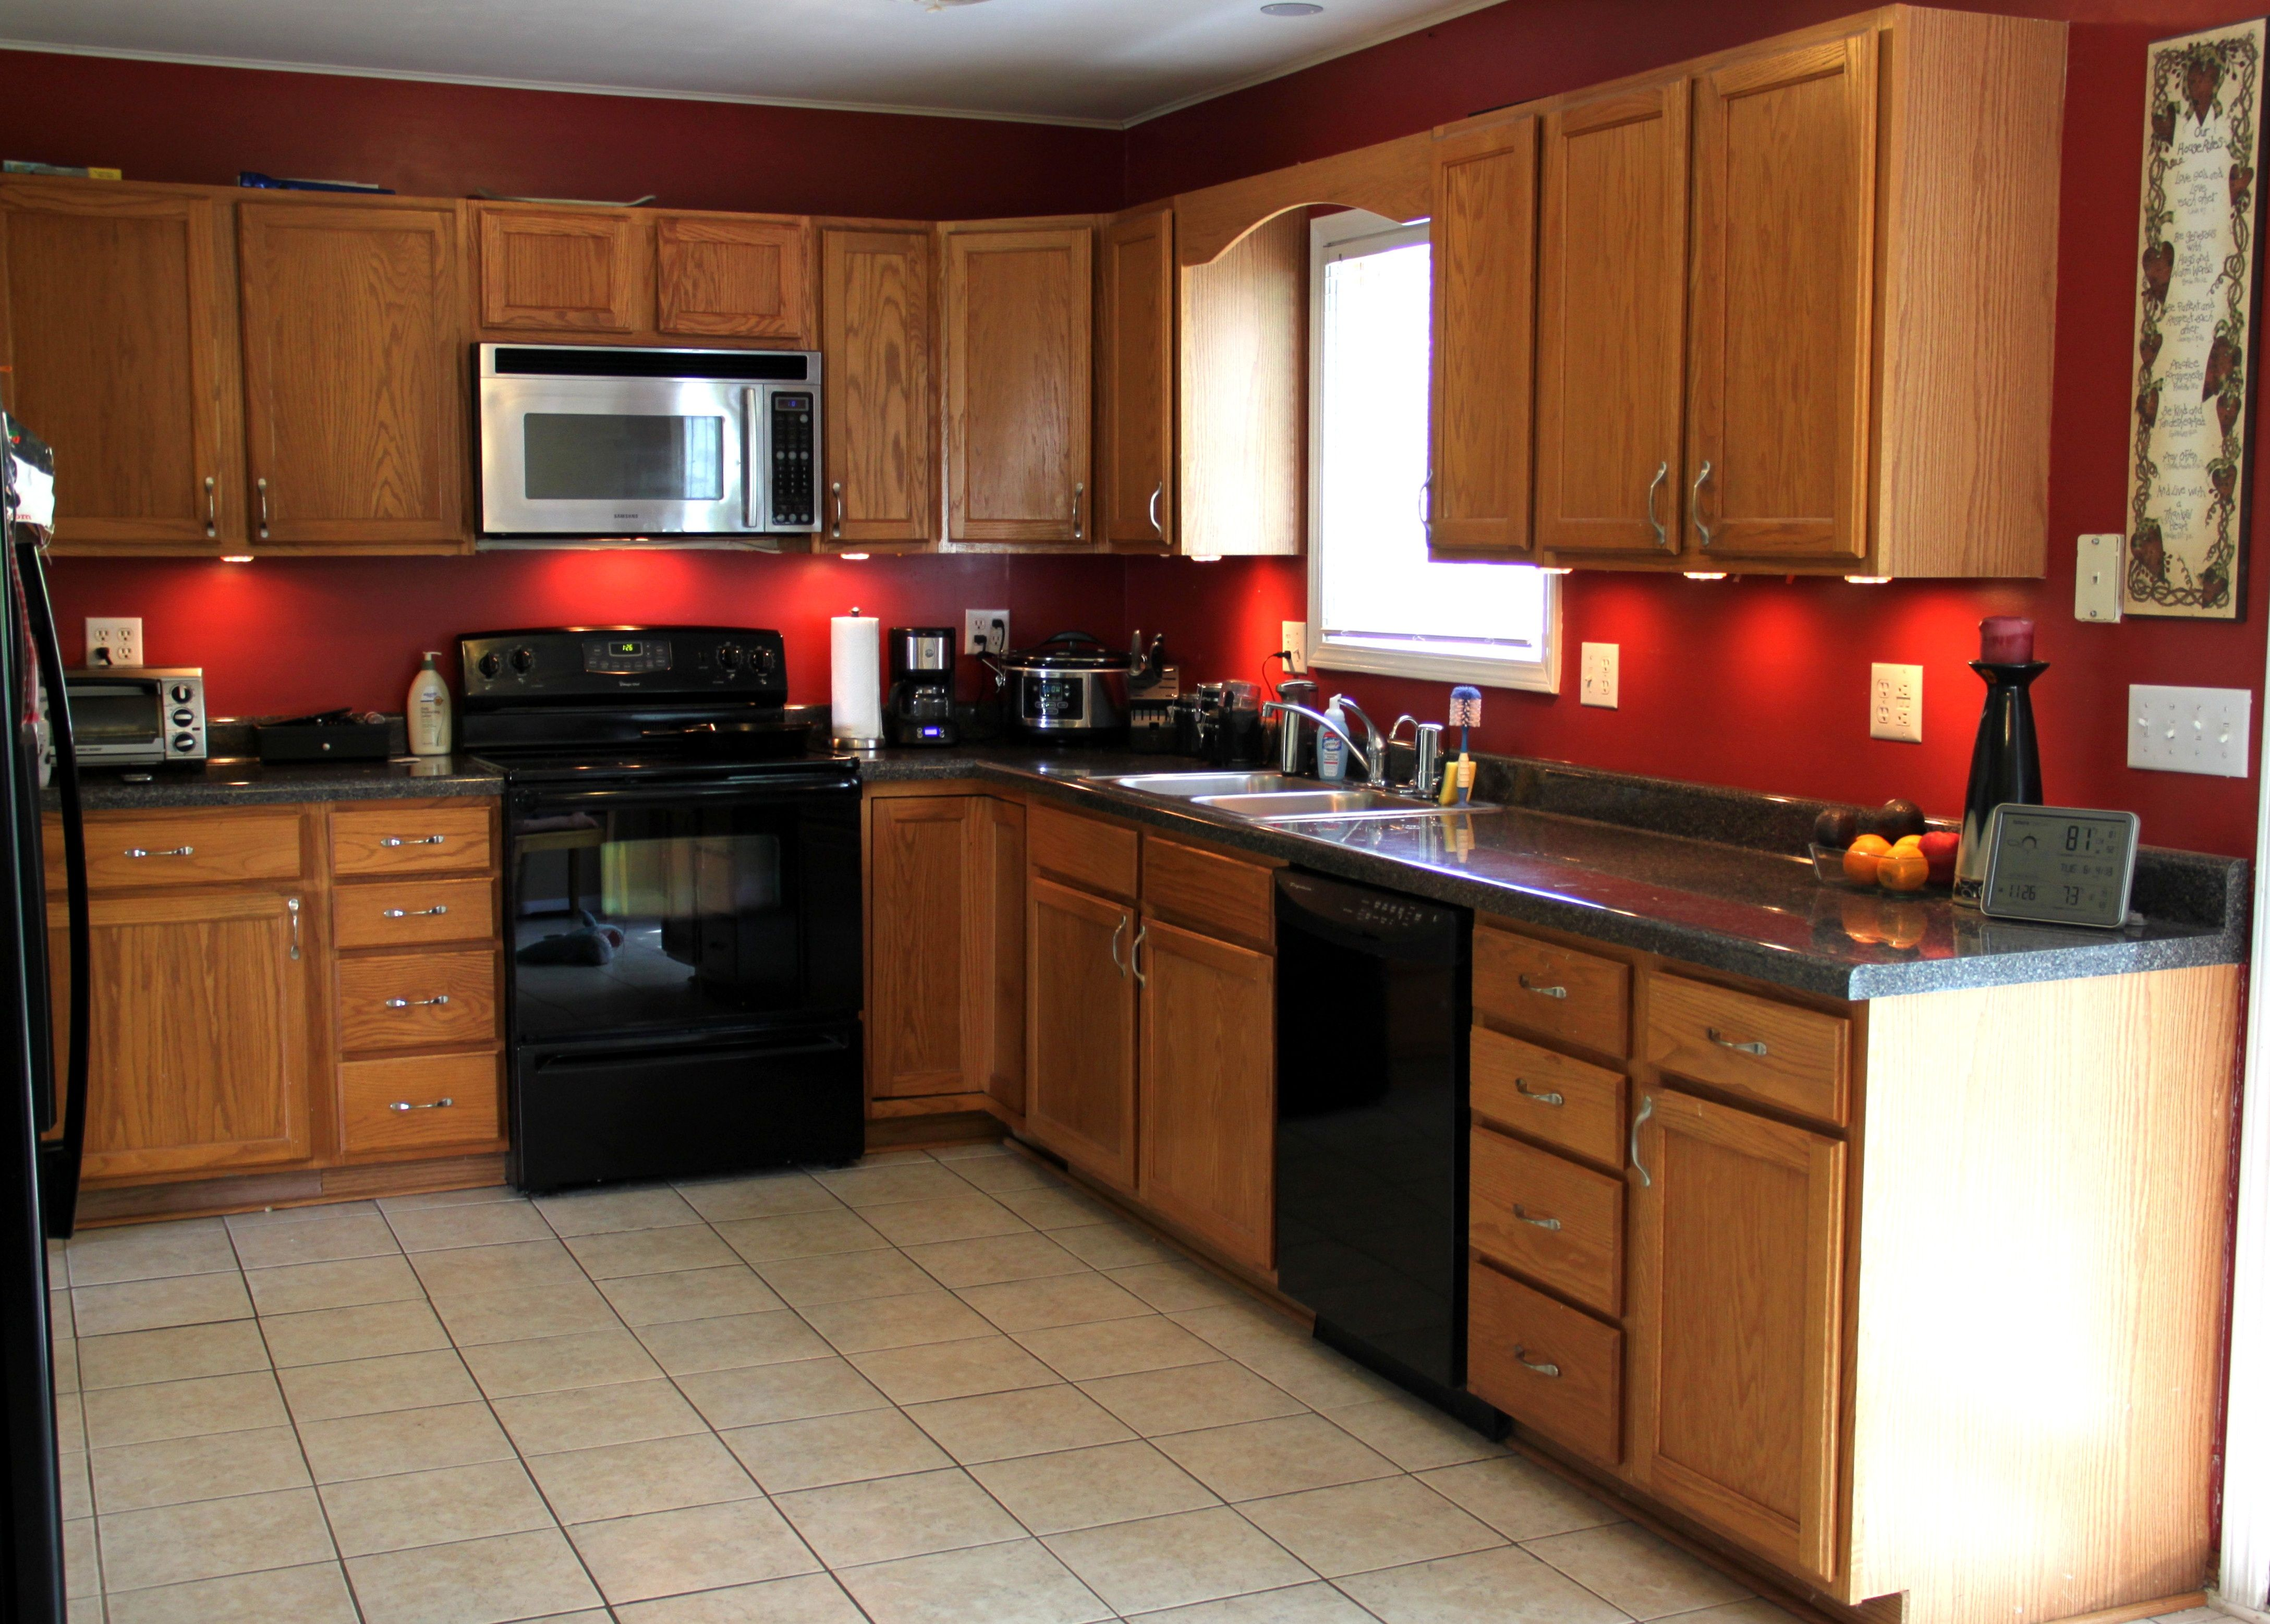 Image Result For Kitchen Red Walls Oak Cabinets Red Kitchen Cabinets Red Kitchen Walls Oak Kitchen Cabinets